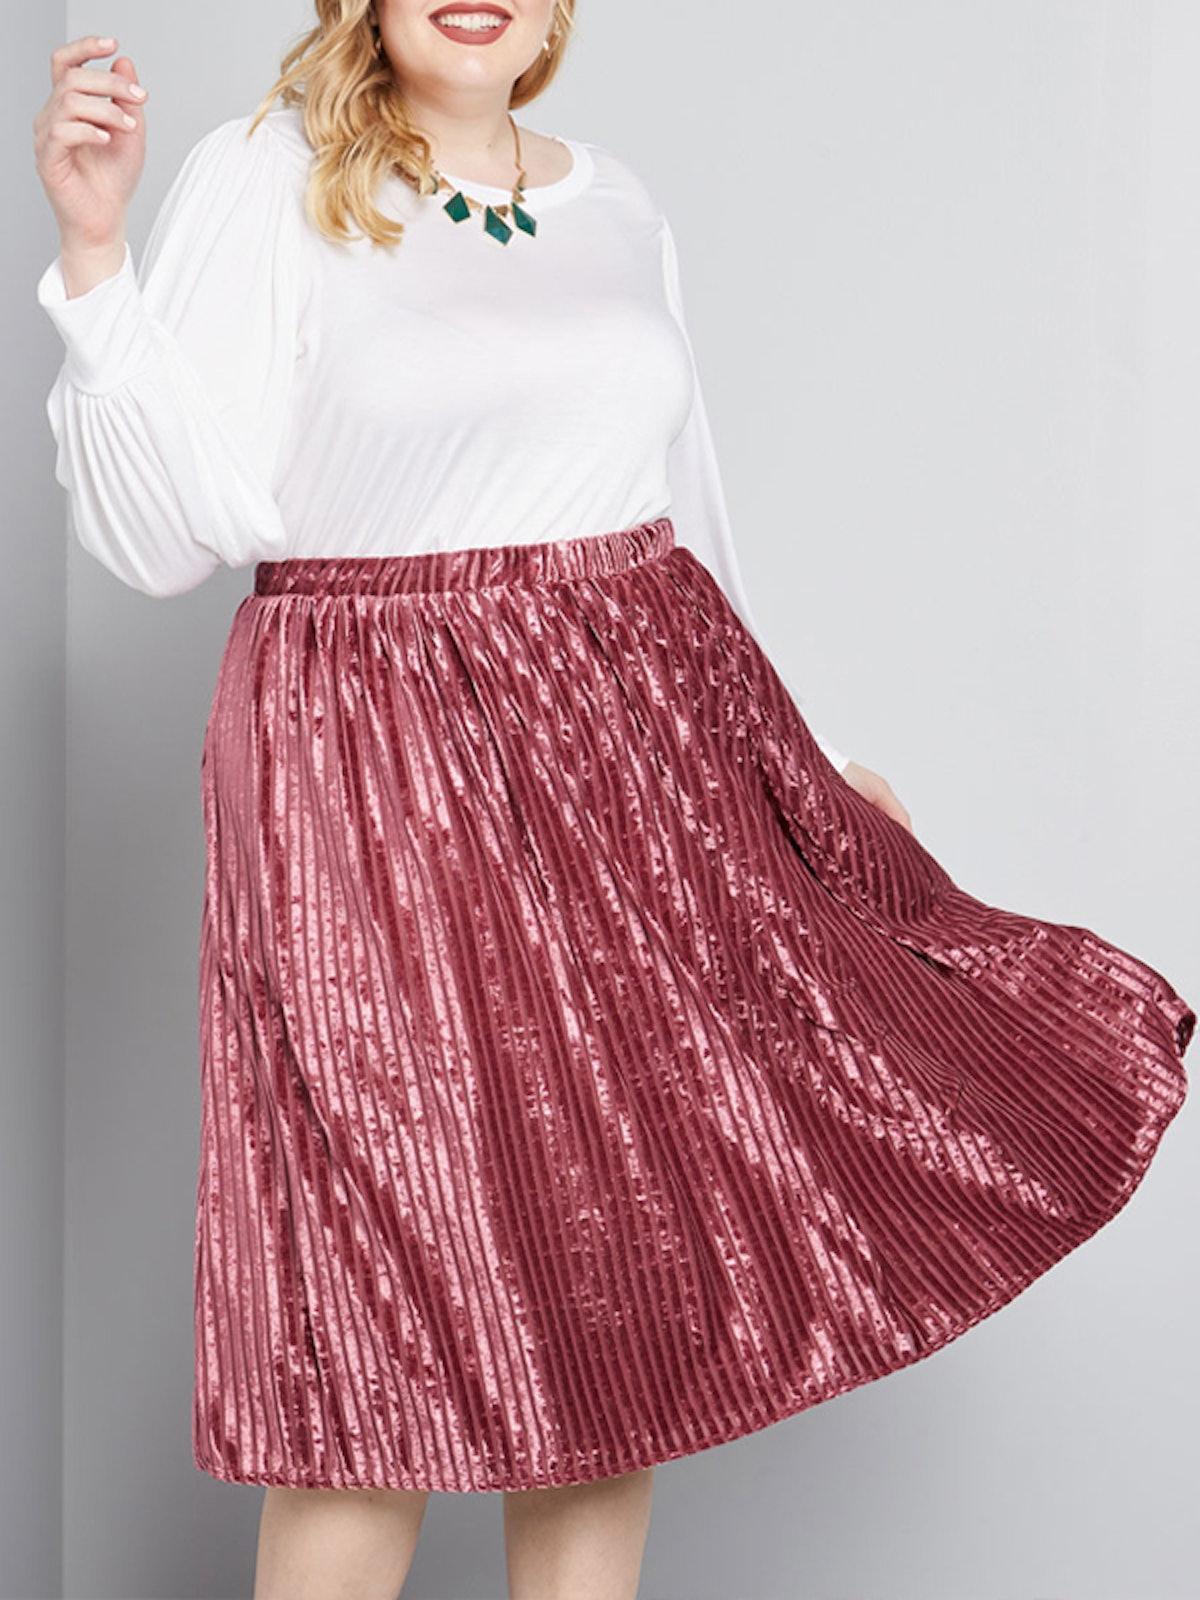 Simply Stylish Velvet Midi Skirt